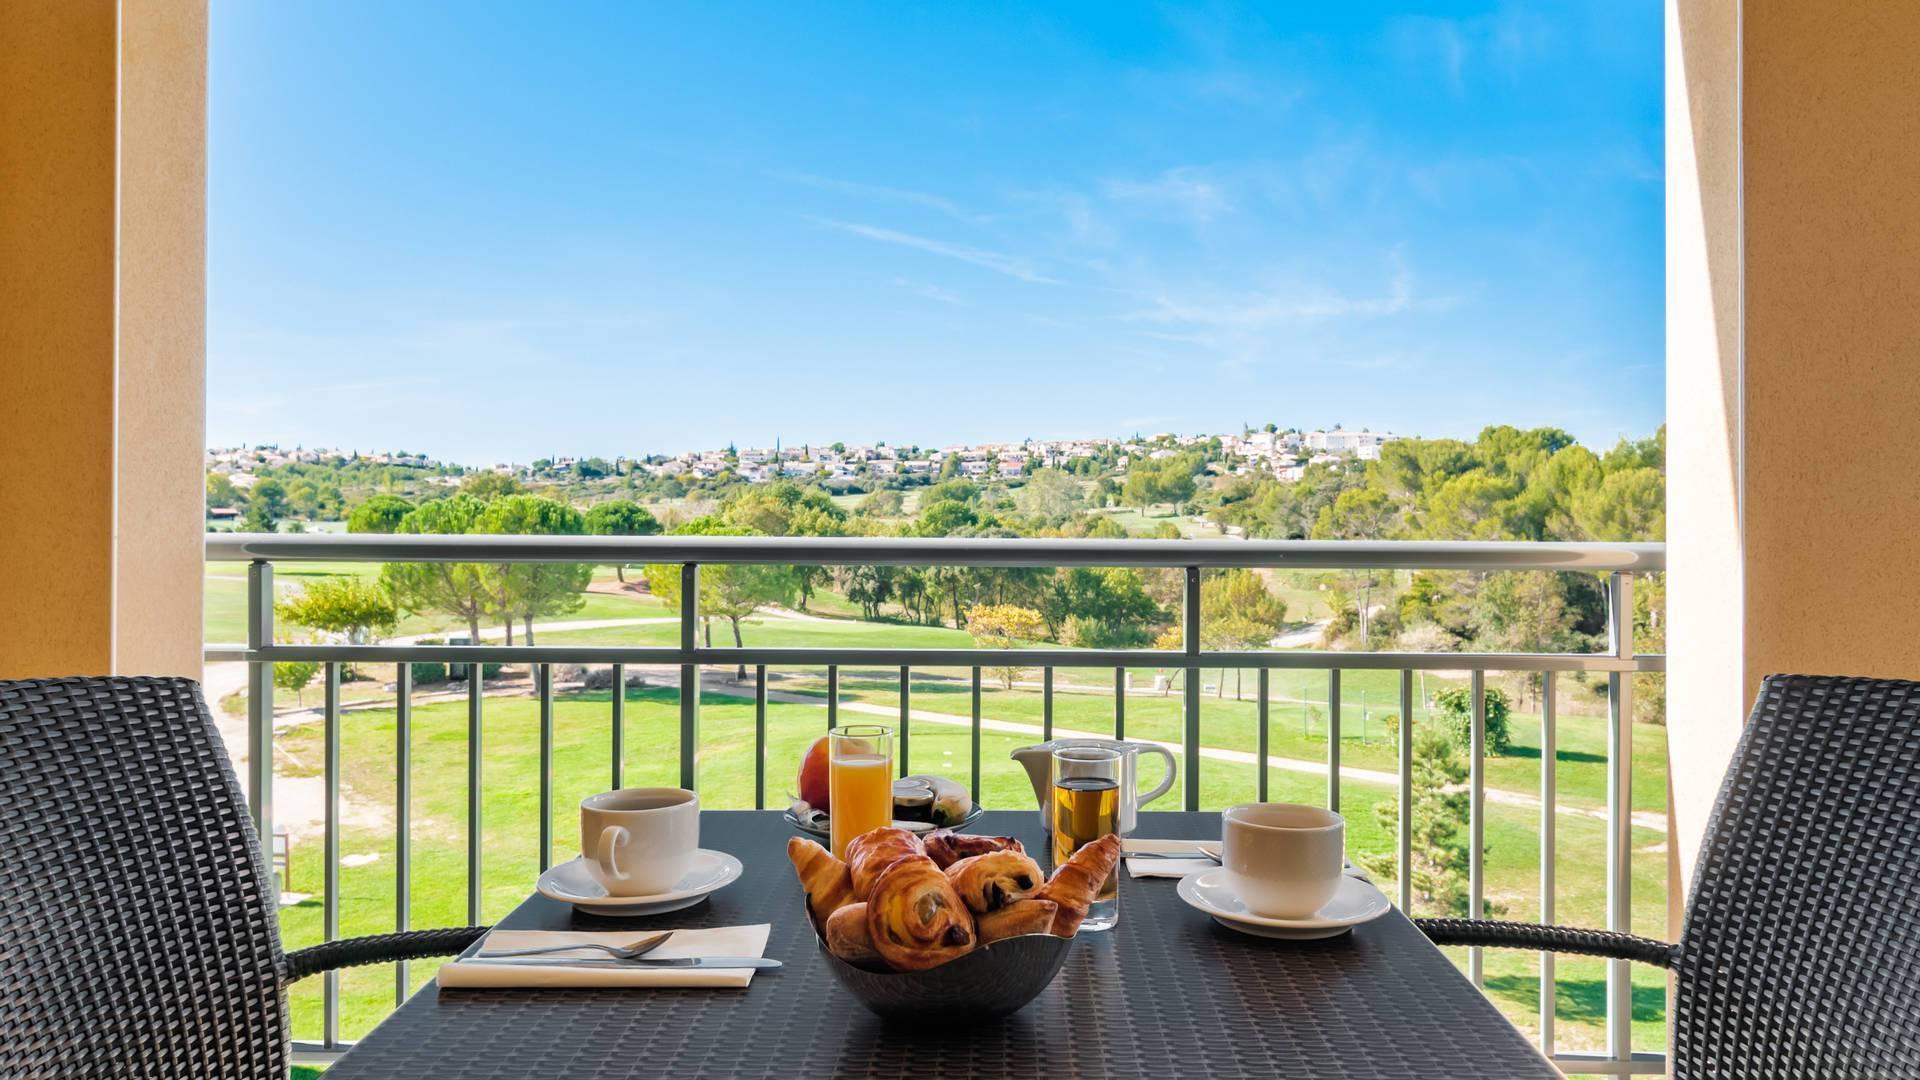 hotel-spa-de-fontcaude-juvignac-montpellier-occitanie-chambre-avec-vue